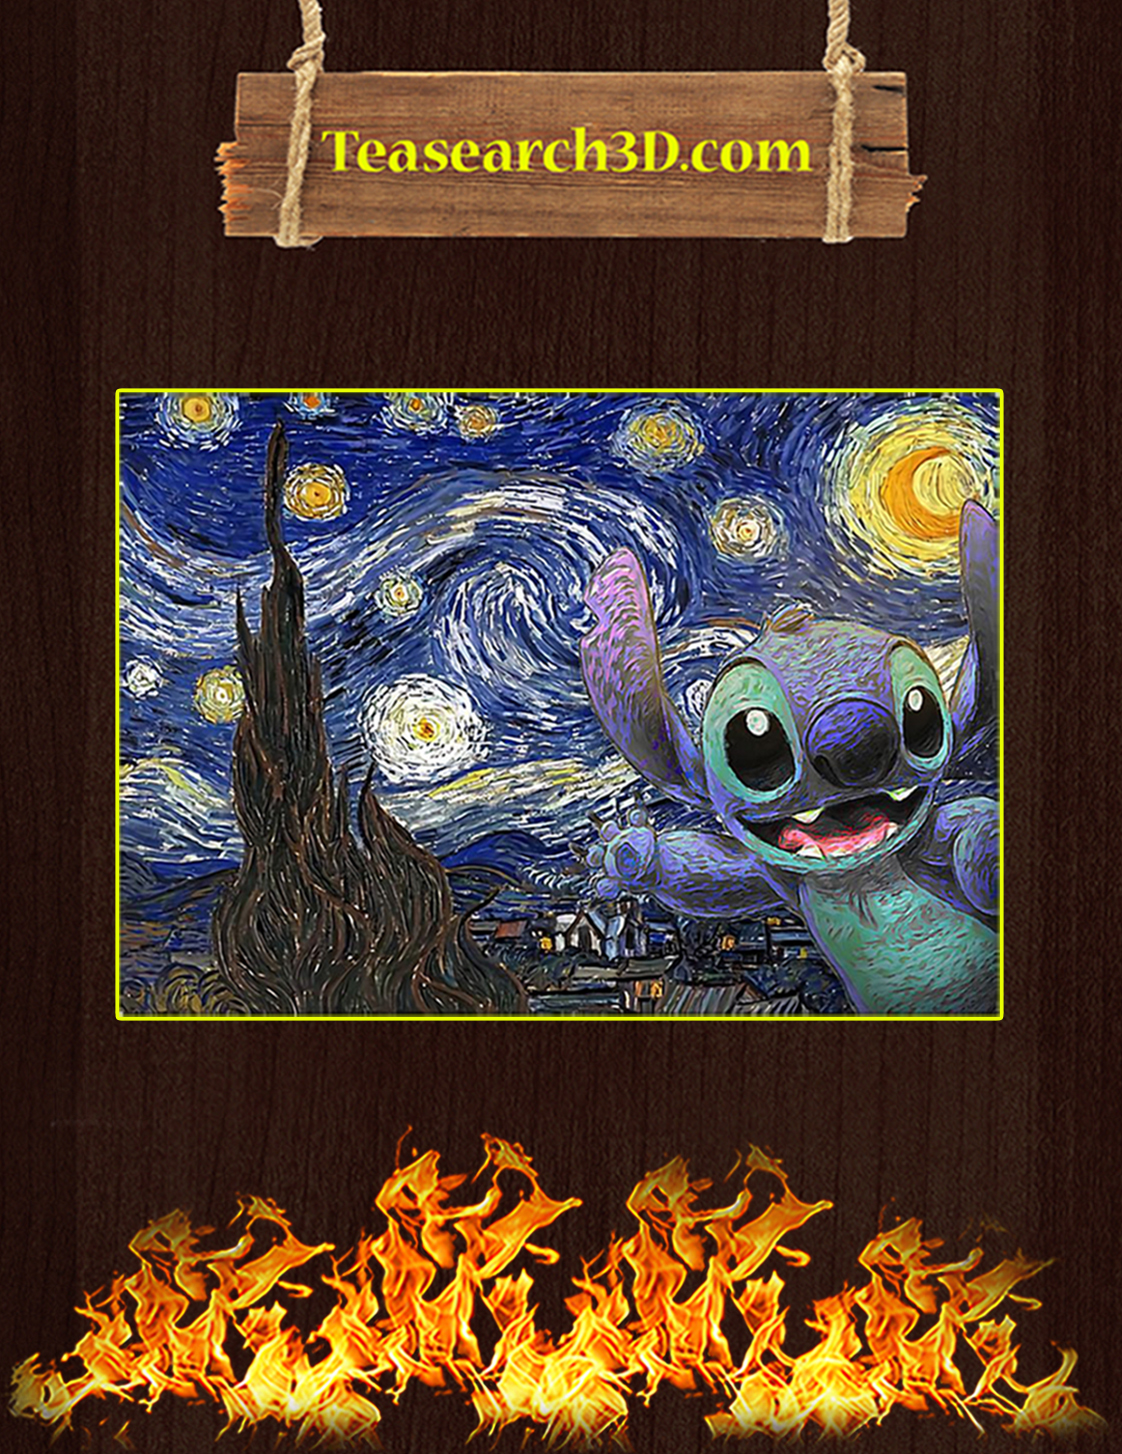 Stitch starry night poster A3